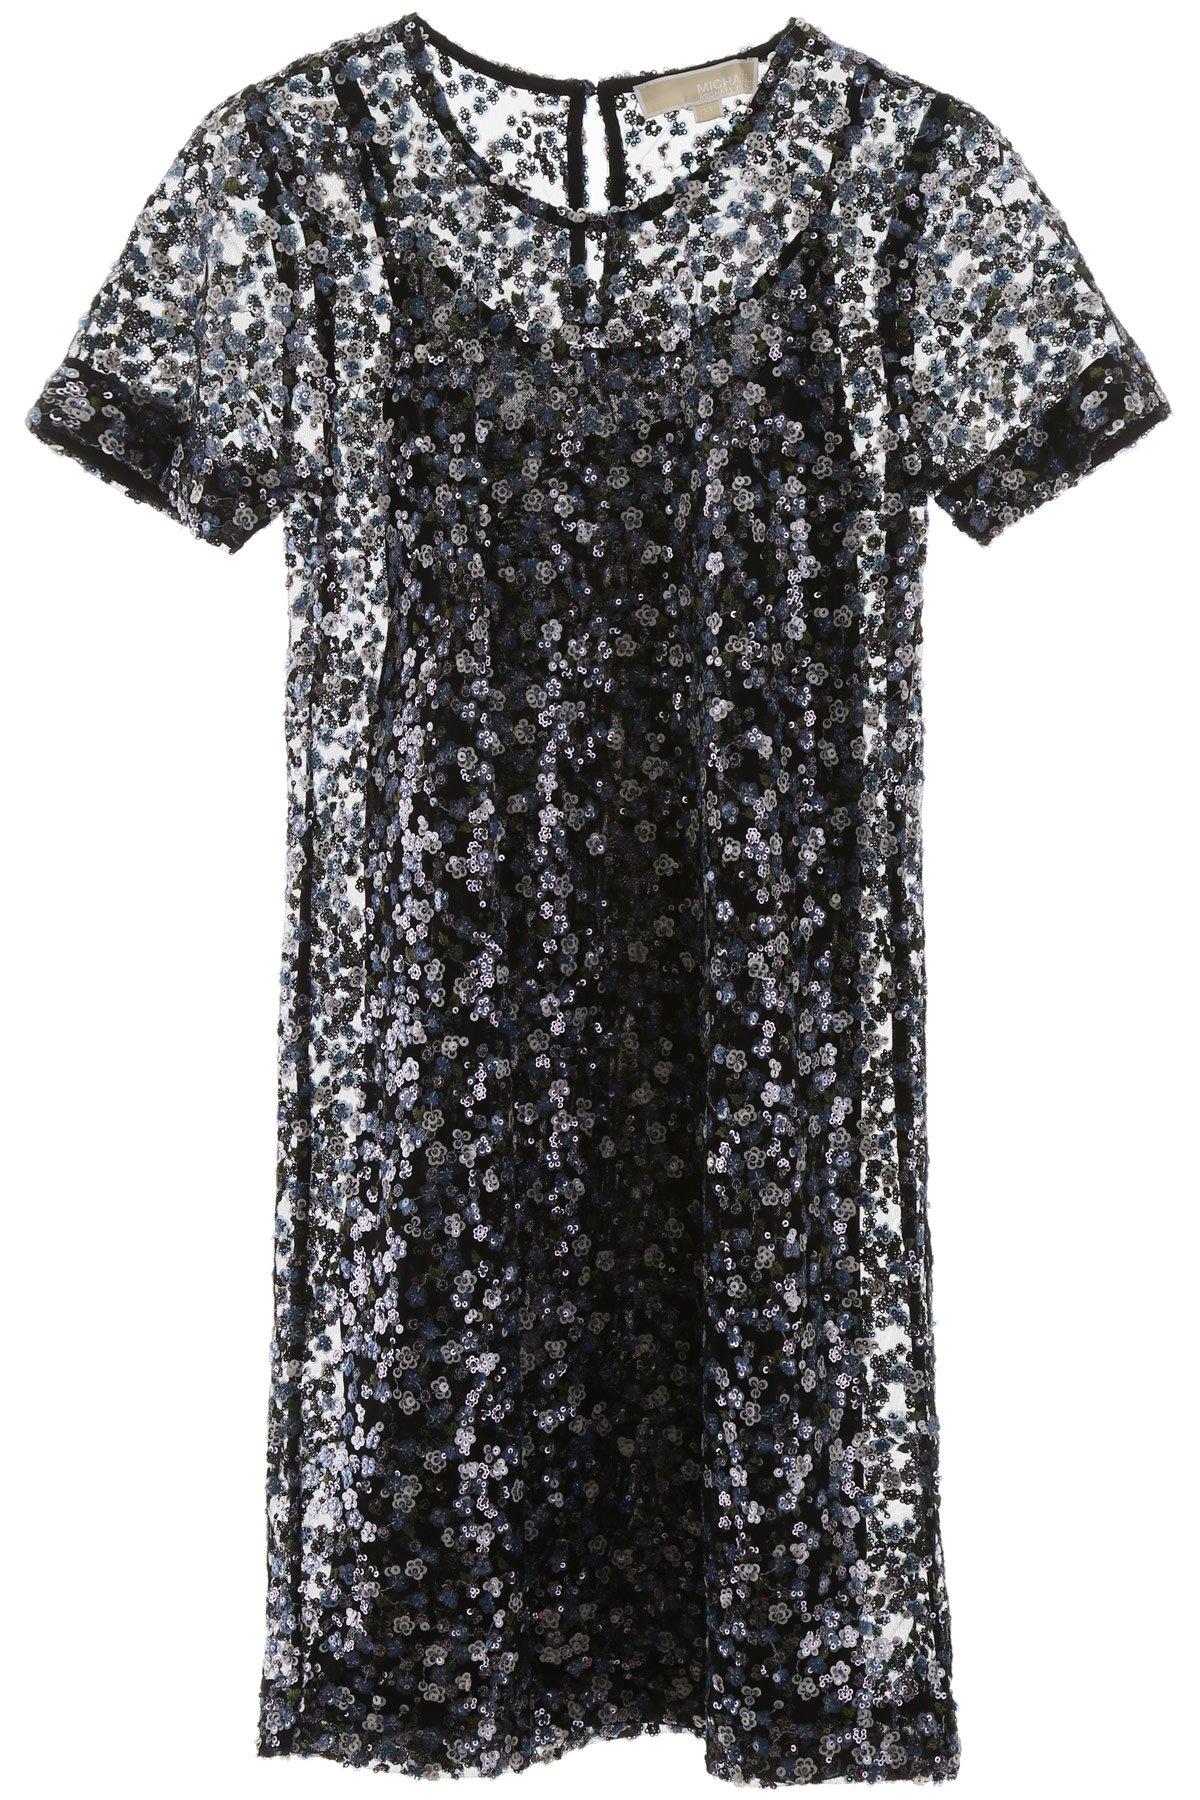 Michael michael kors sequined dress